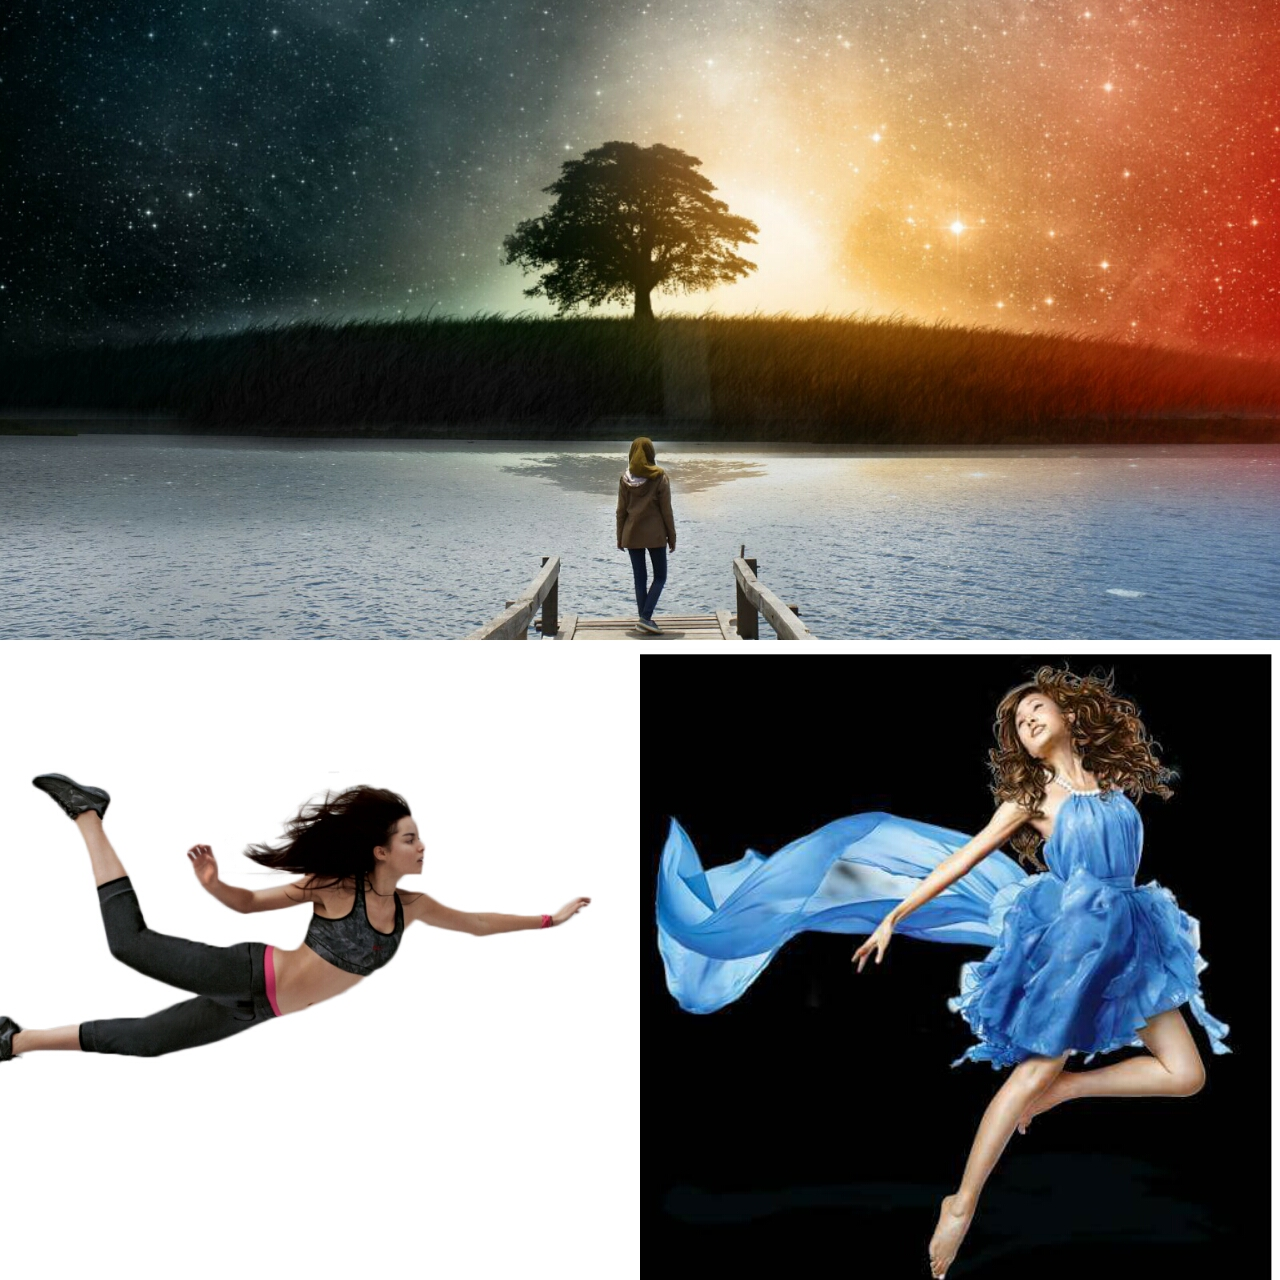 Cara Membuat Line Art Foto Galaxy Sky Dengan Picsart